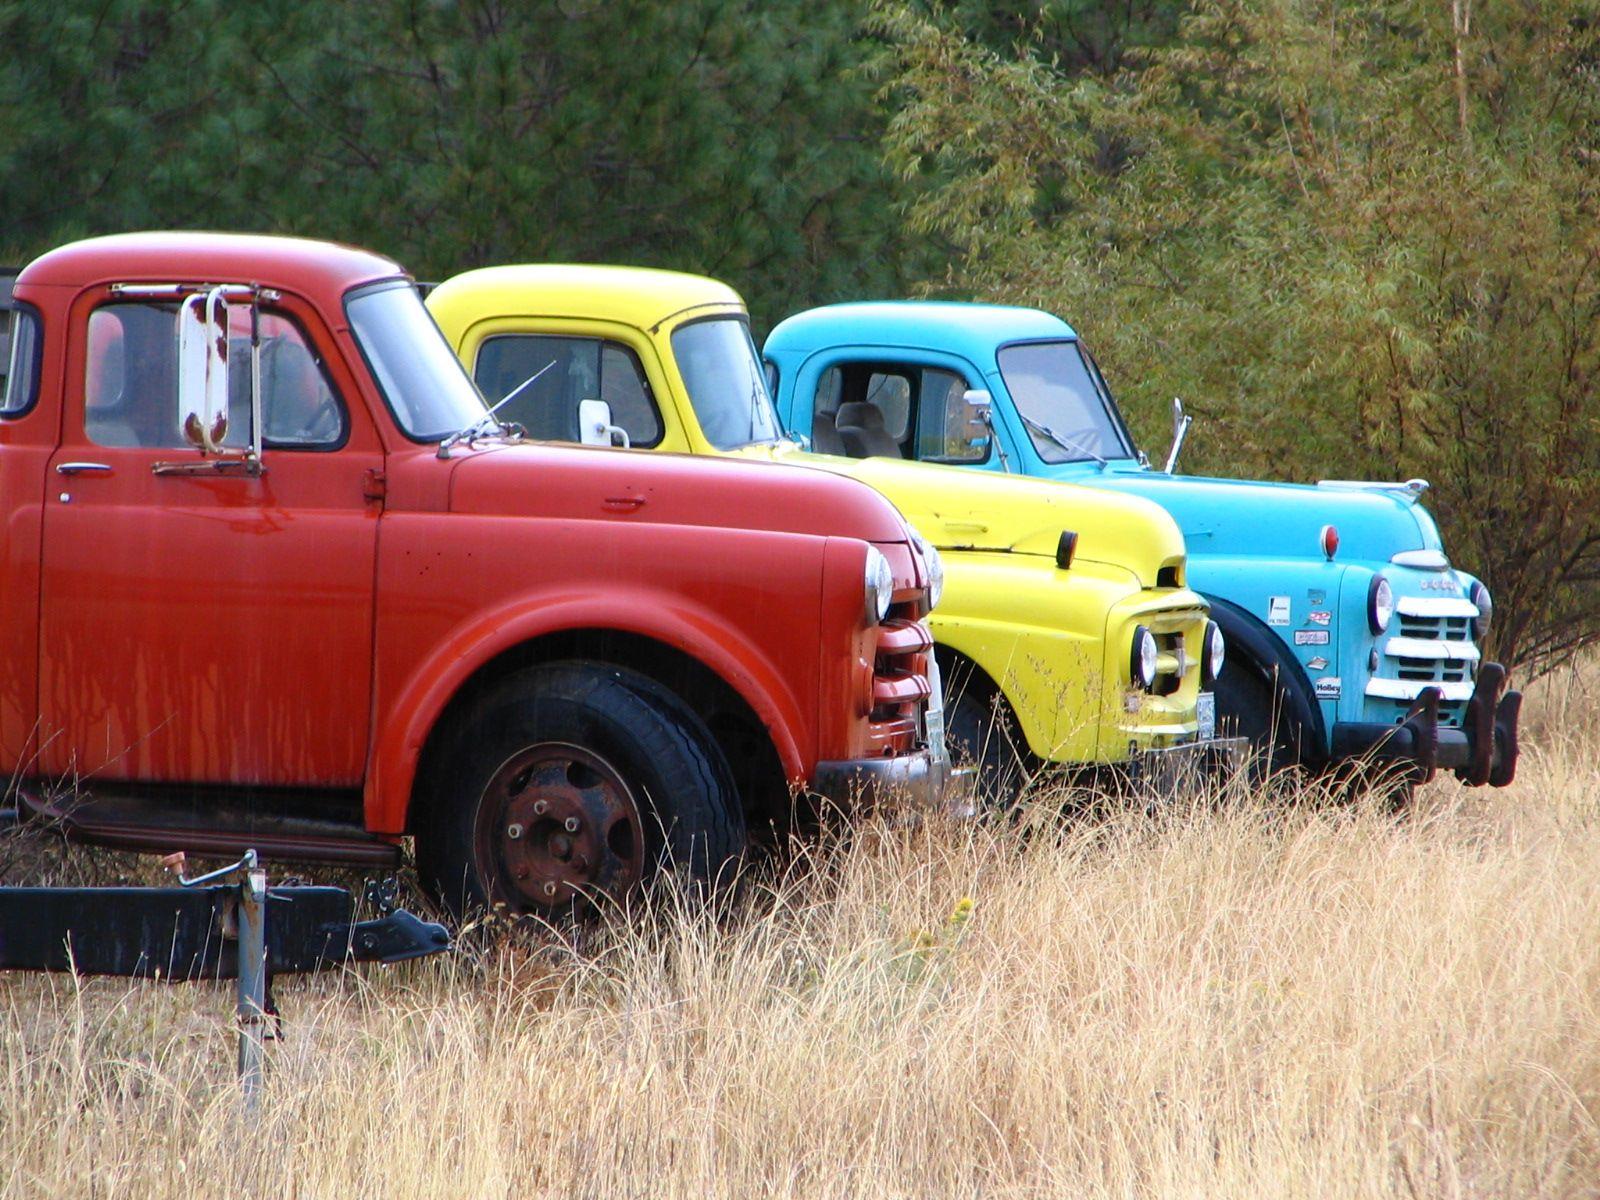 Cool trucks | Random Awesomeness | Pinterest | Fields, Cars and ...